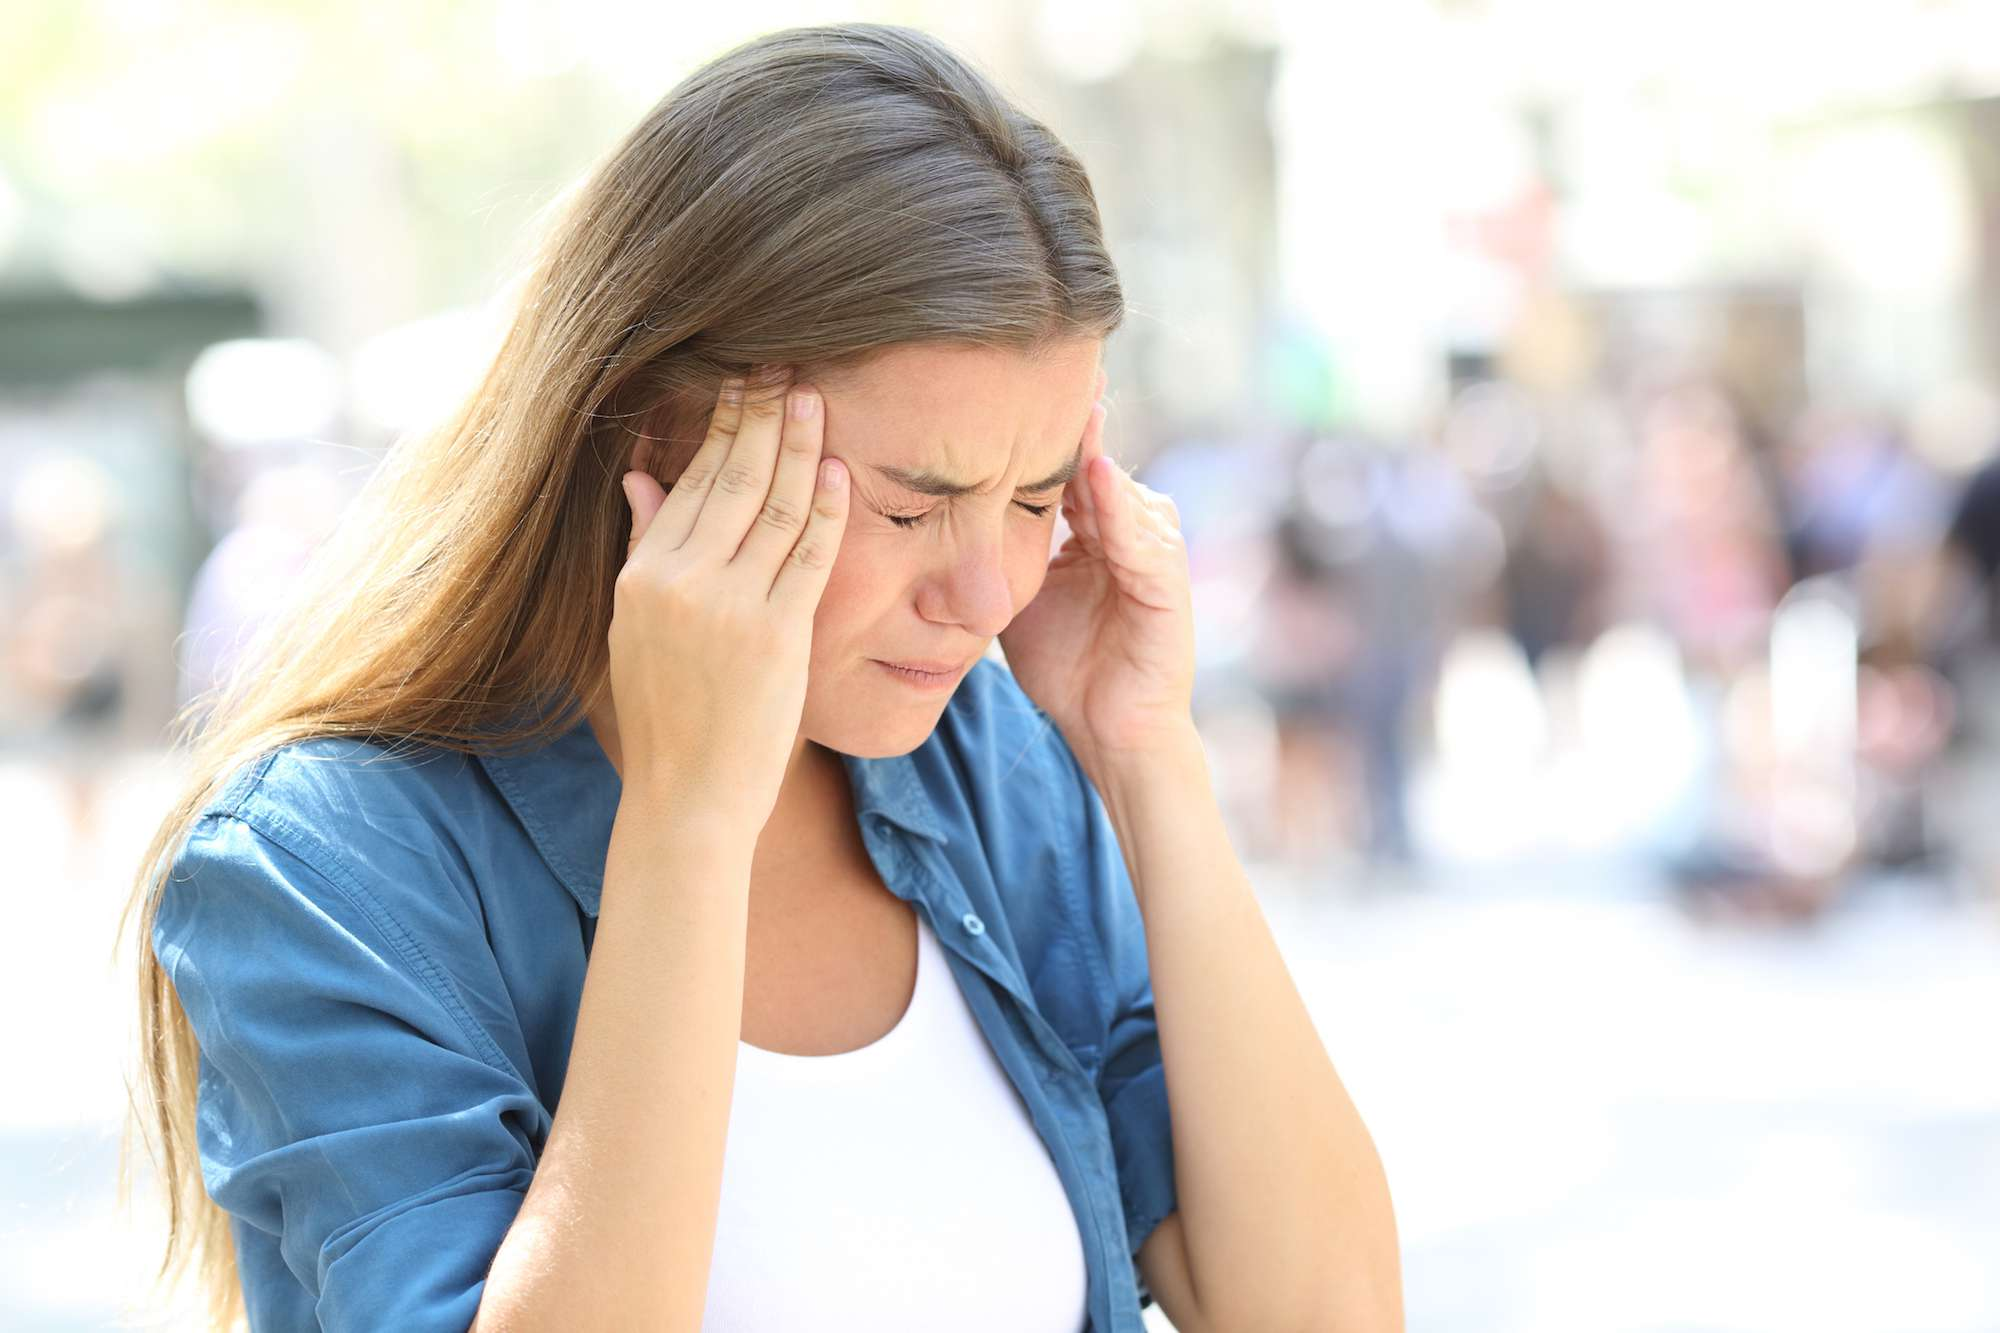 Woman with tremendous headache